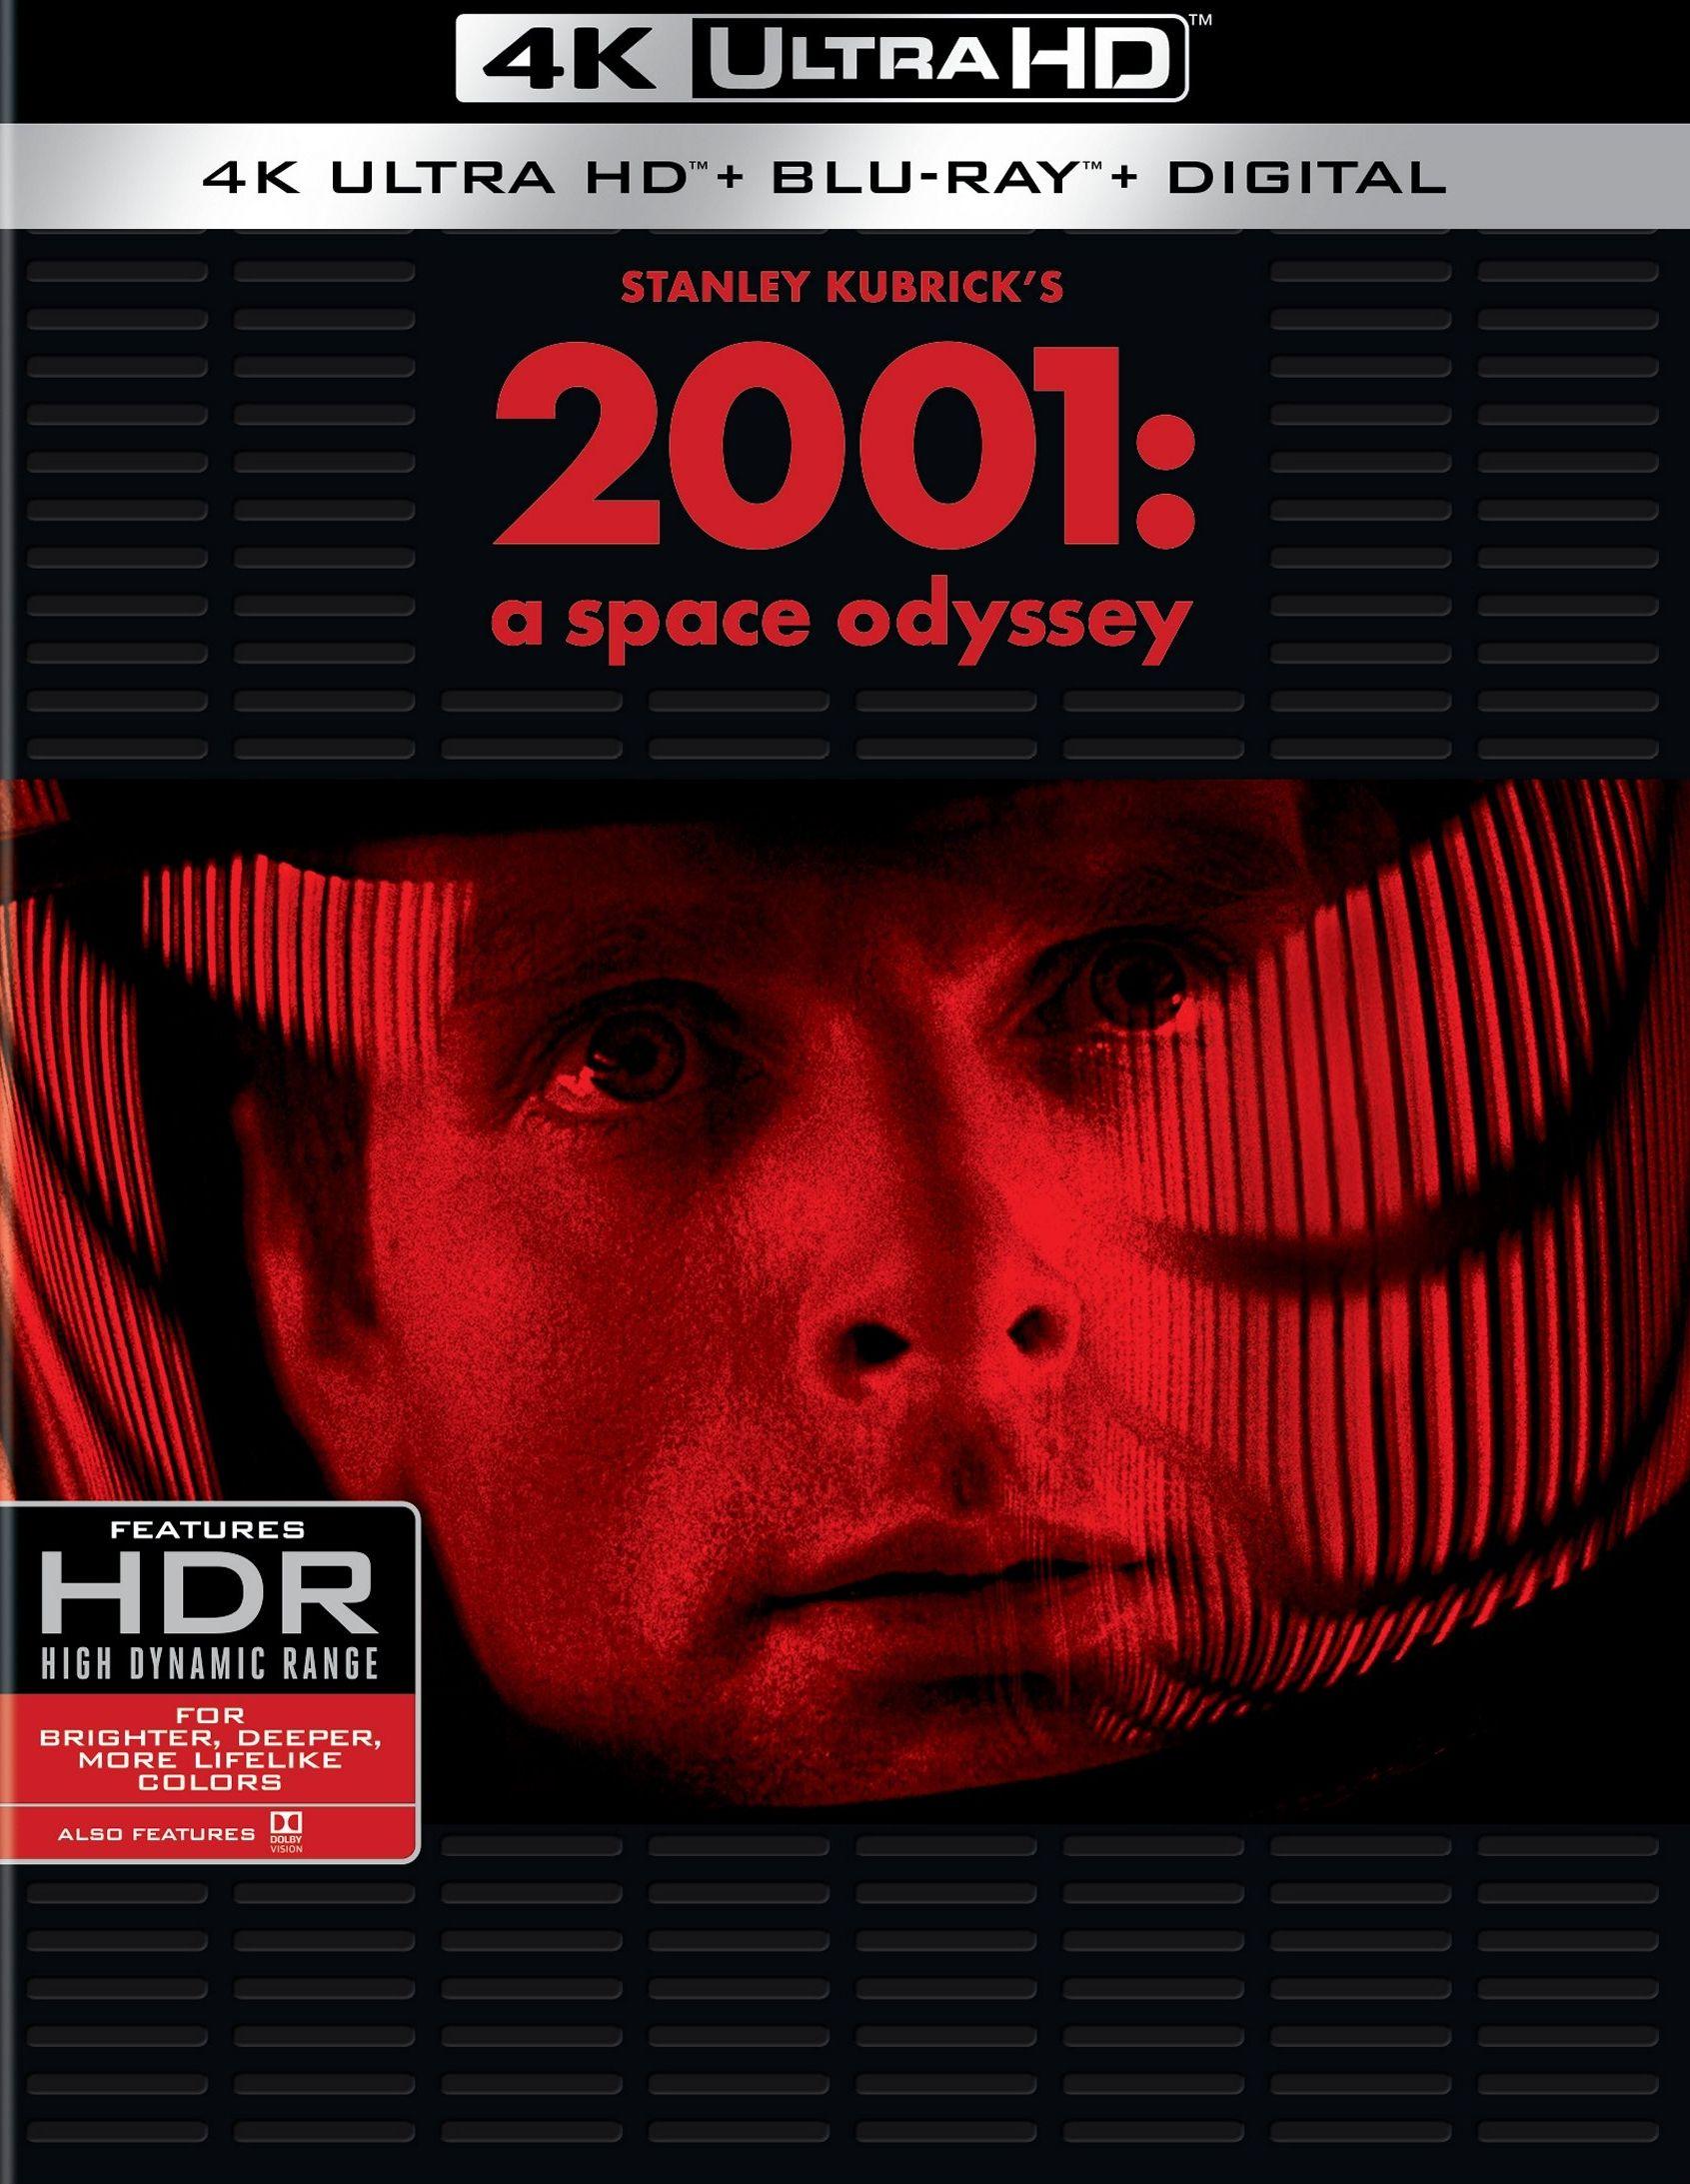 2001: A Space Odyssey [1968] (4K Ultra HD Blu-ray Steelbook) for £23.99 @ eBay / theentertainmentstore